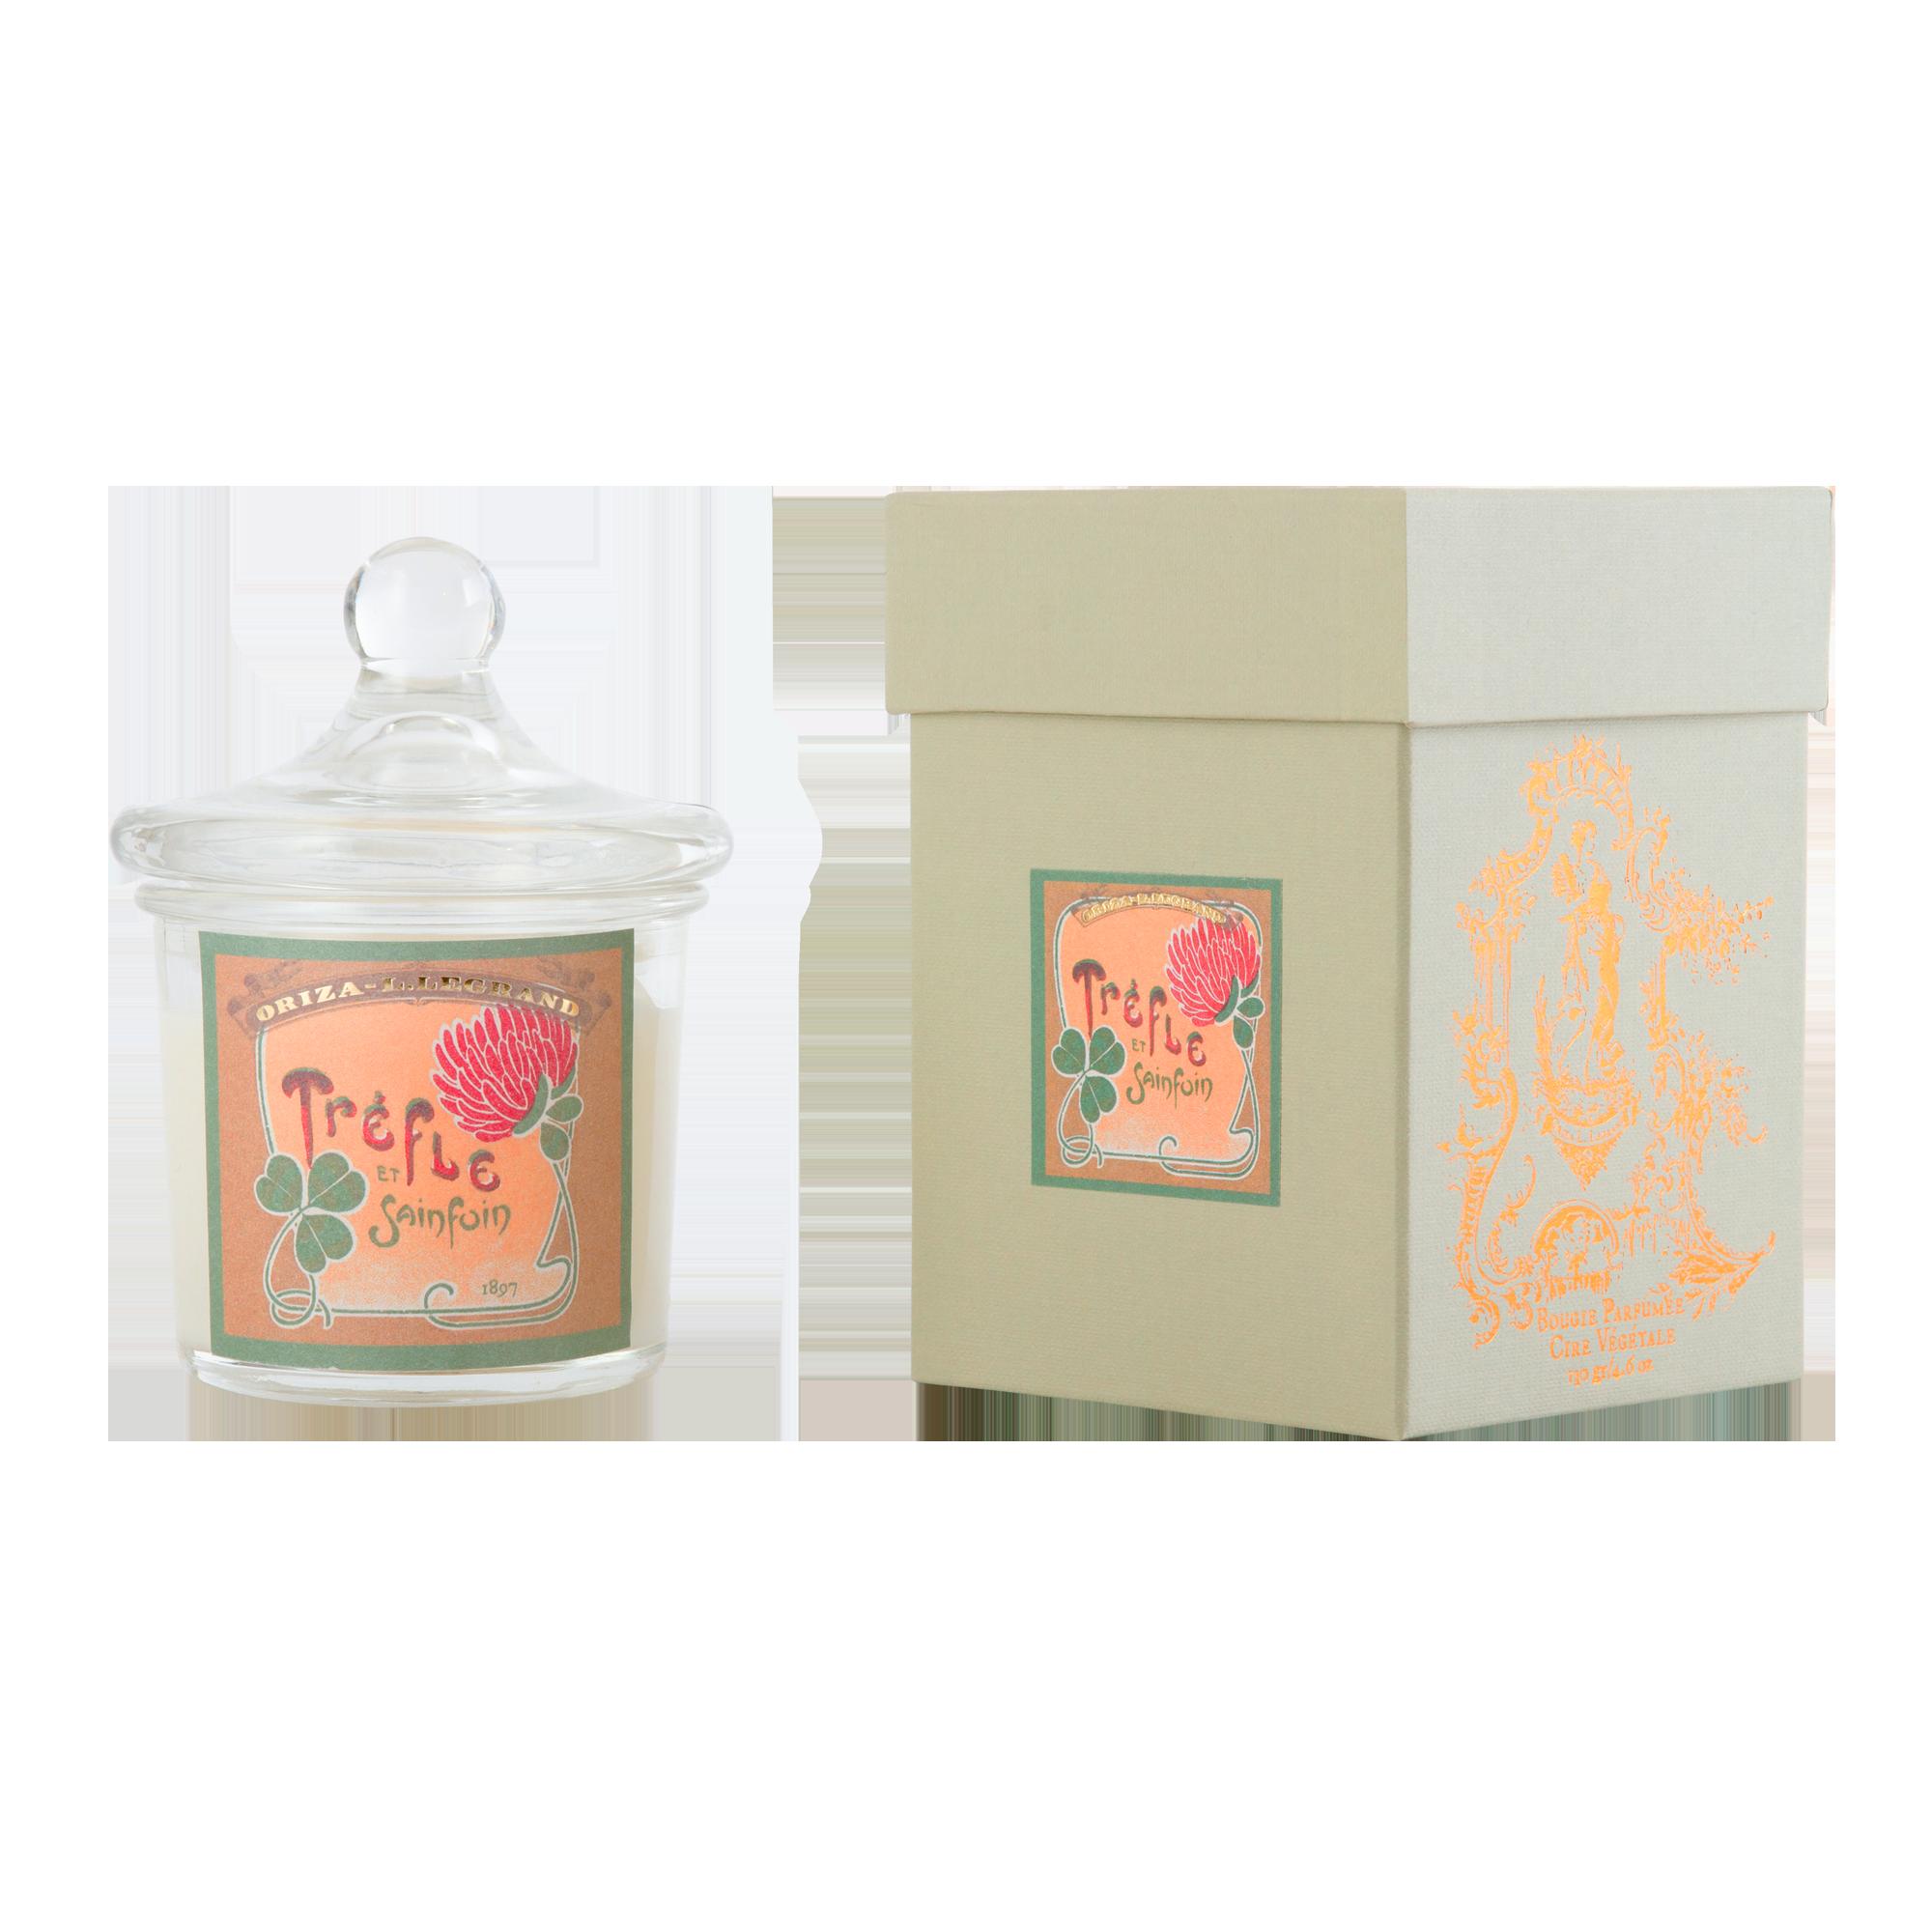 ORIZA L.LEGRAND Trèfle & Sainfoin Perfumed Candle 130 g